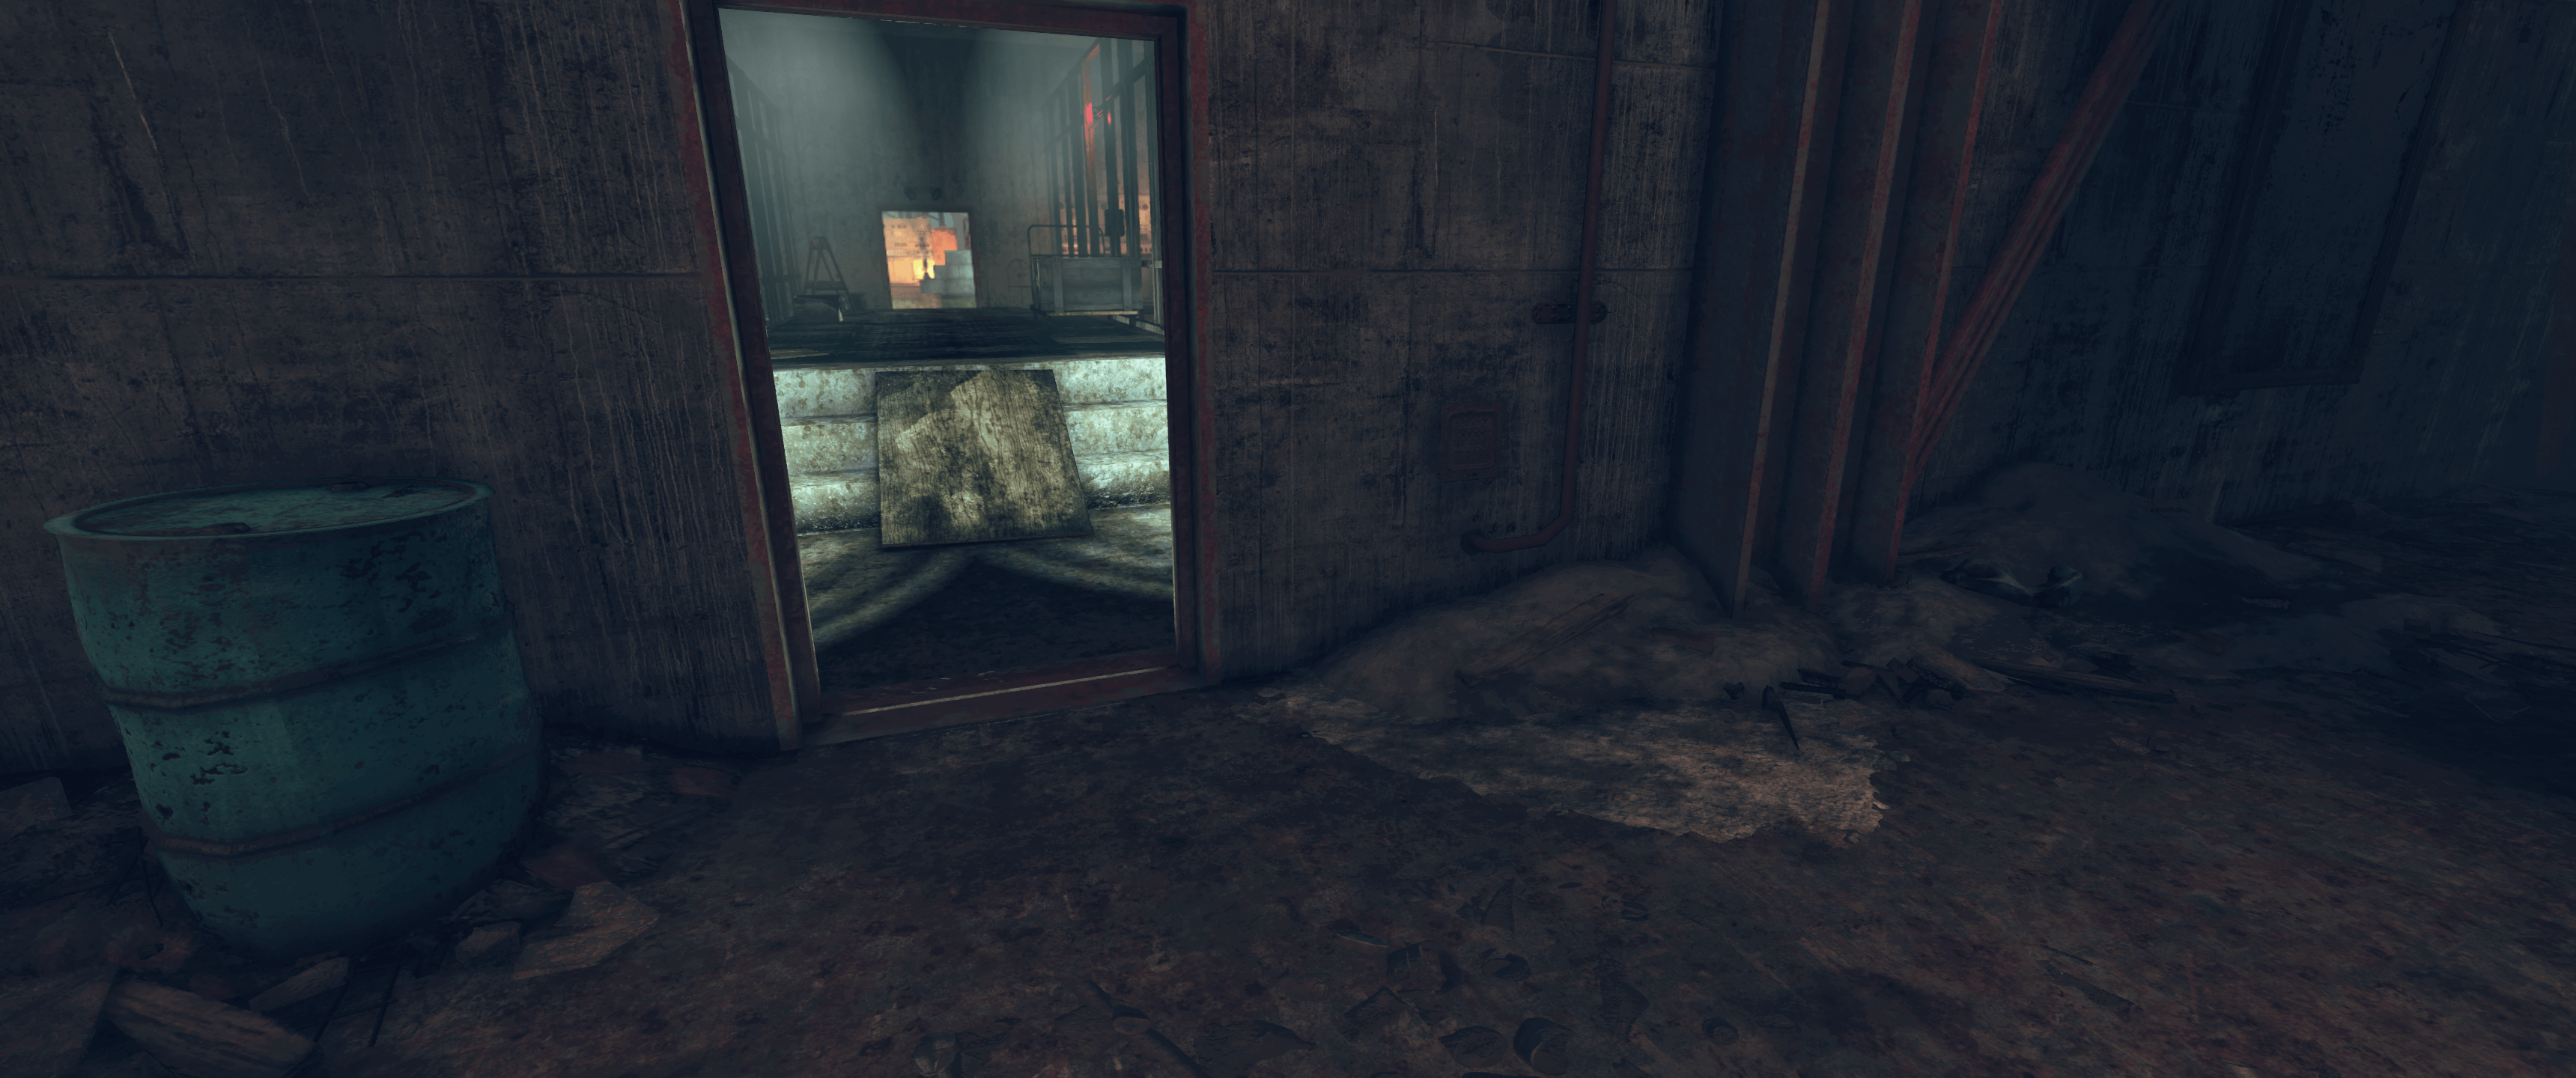 Fallout 76 - Tonne an der Seite